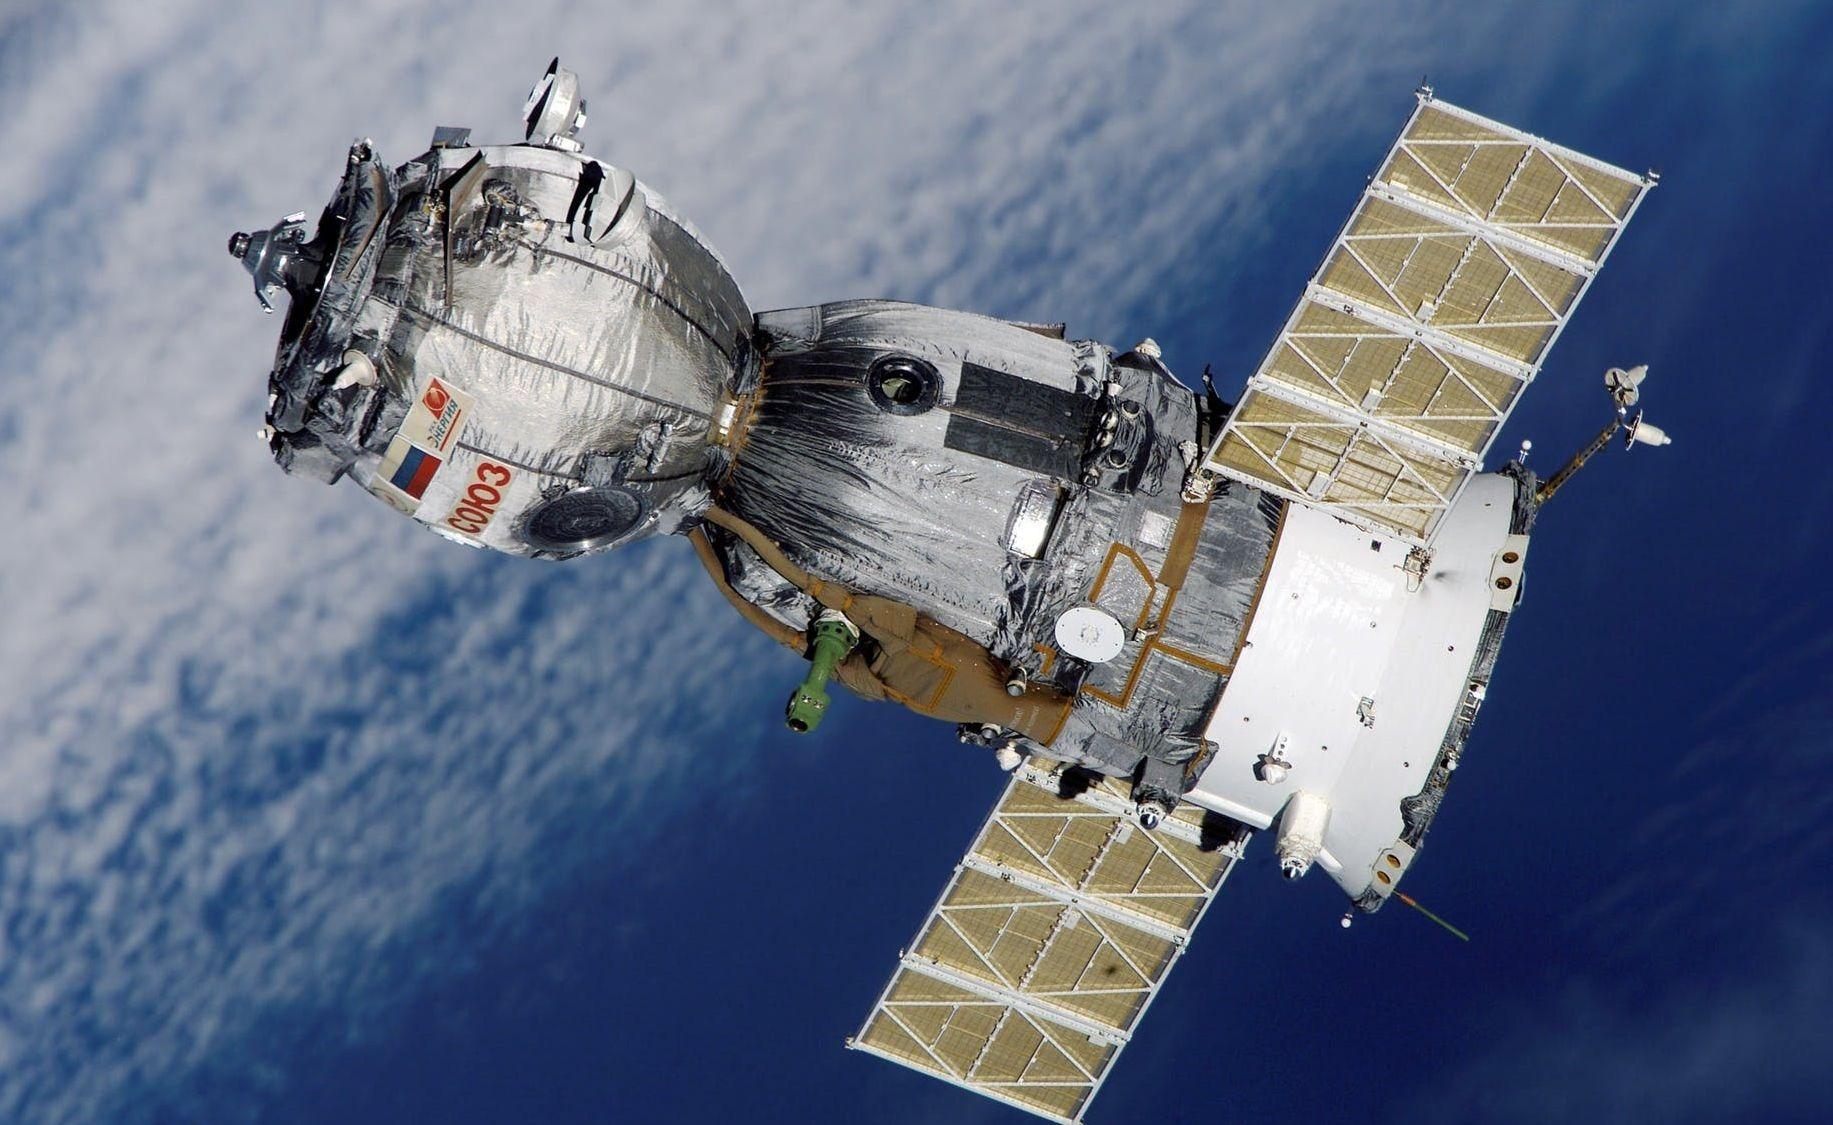 Satellite soyuz spaceship space station 41006